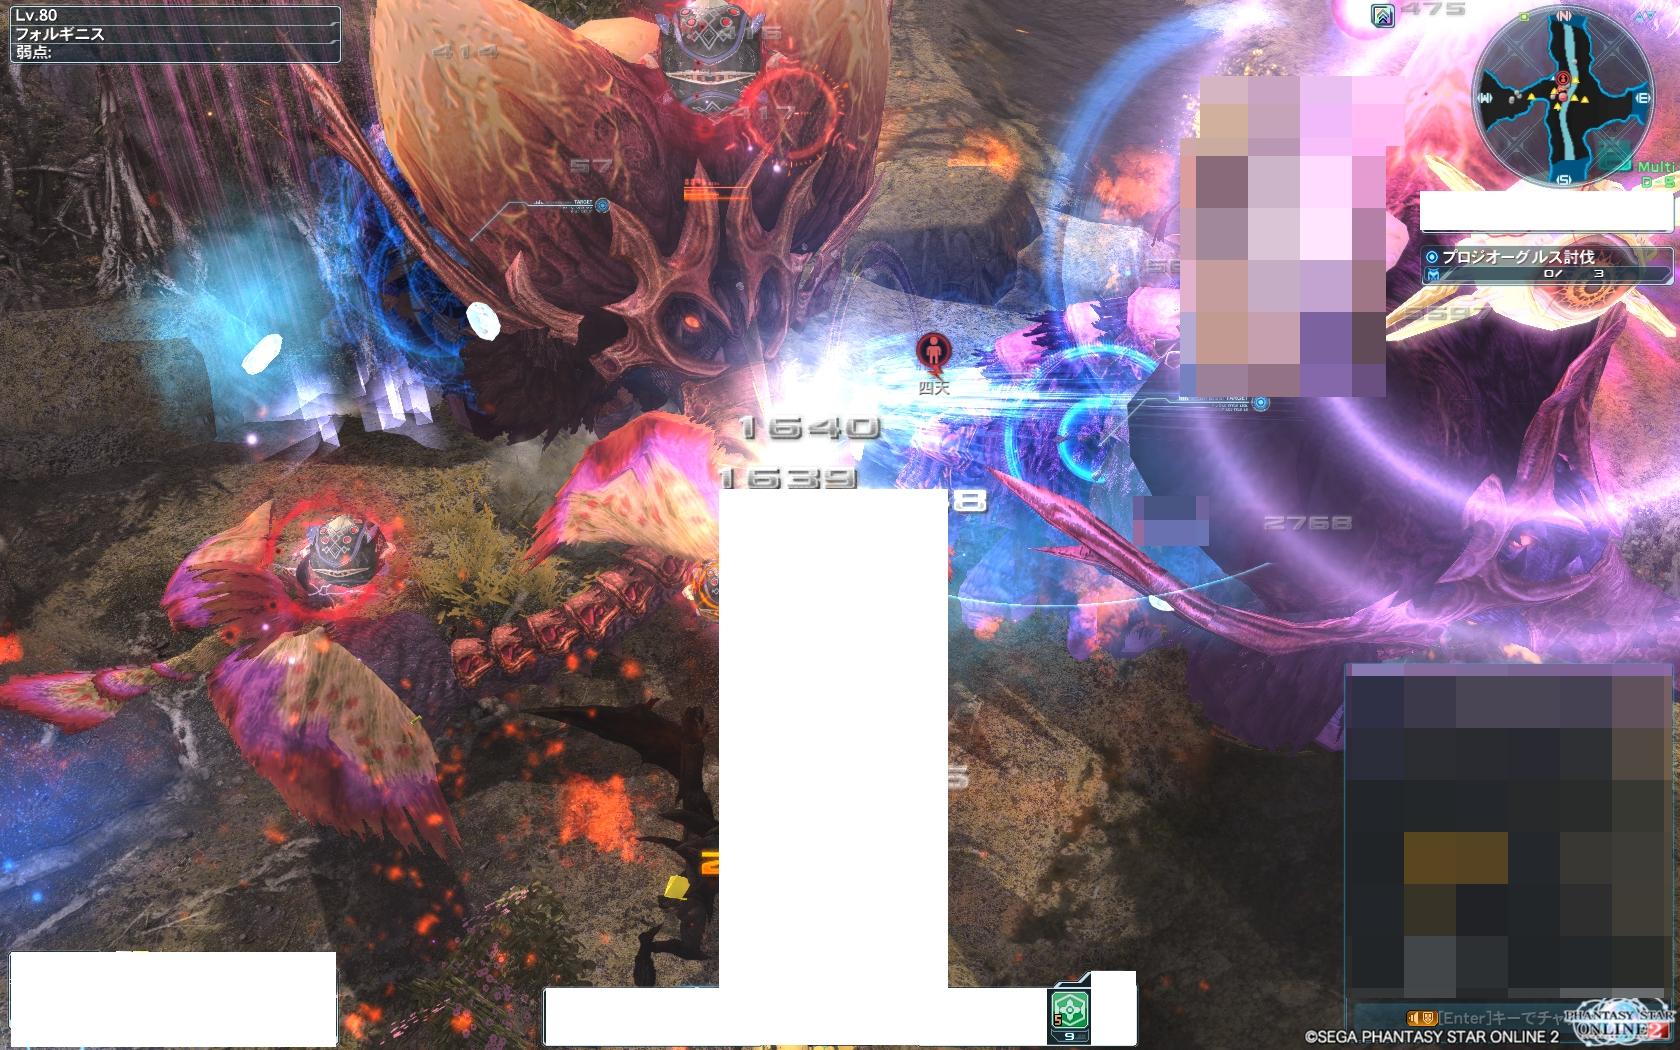 【PSO2】PHANTASY STAR ONLINE2 ship10 専スレ24 [無断転載禁止]©2ch.netYouTube動画>2本 ->画像>61枚